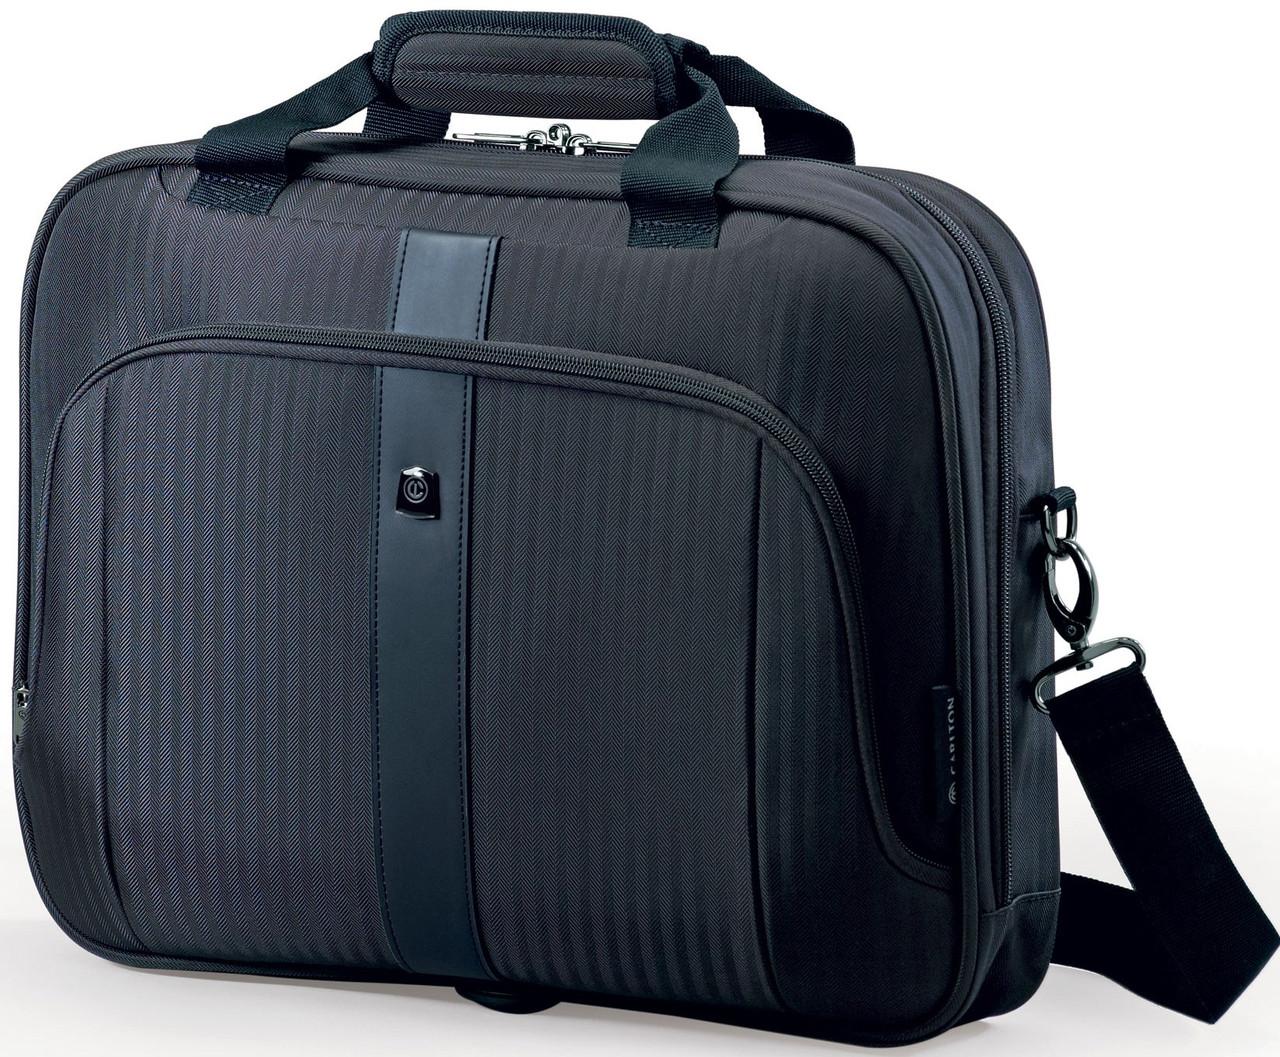 Сумка-портфель для ноутбука 15,6 Carlton 062J101;01